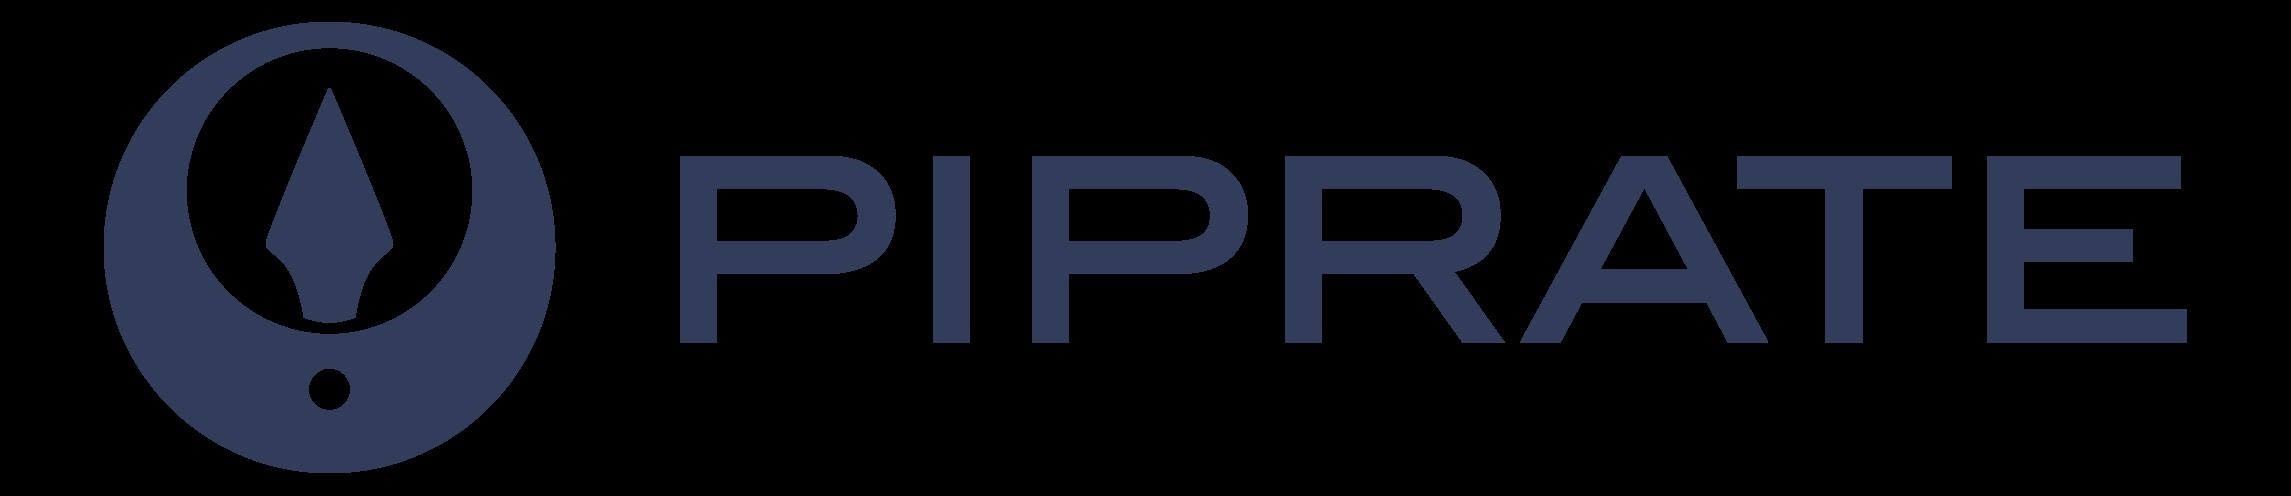 Piprate Logo